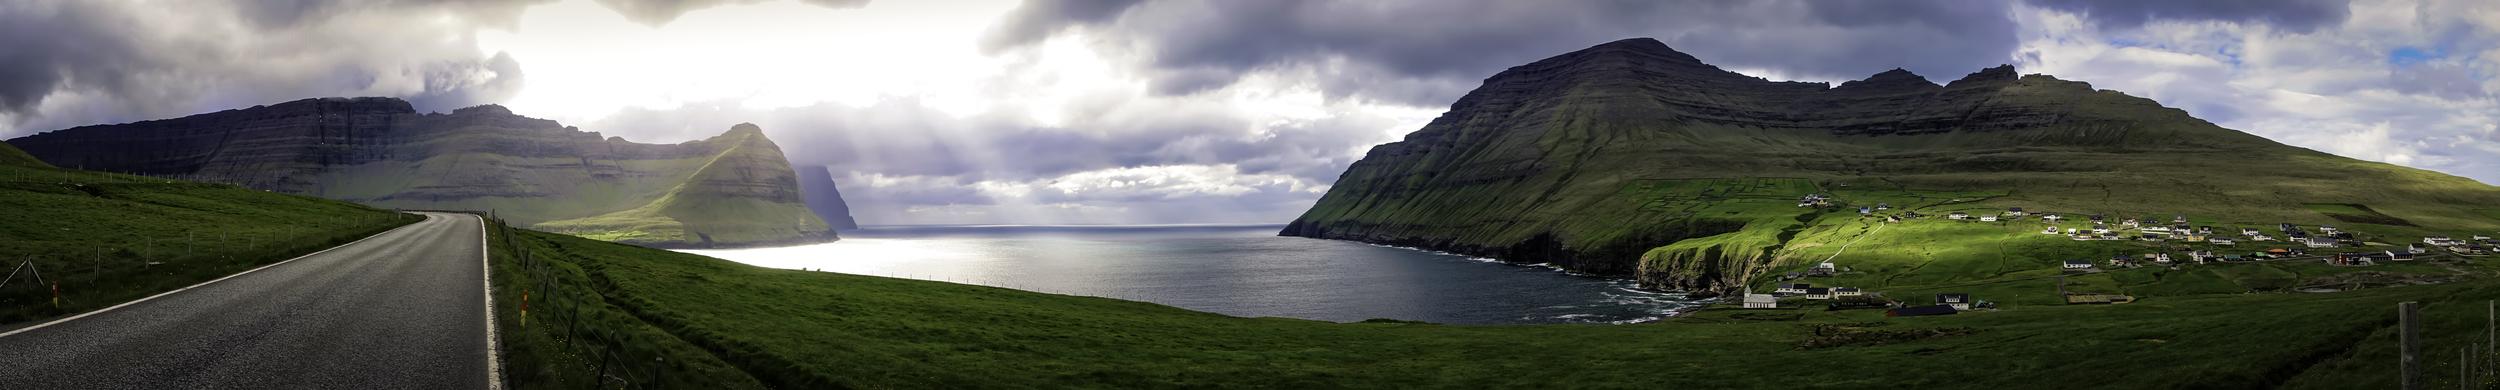 The village of Viðareiði receives a small sun bath.